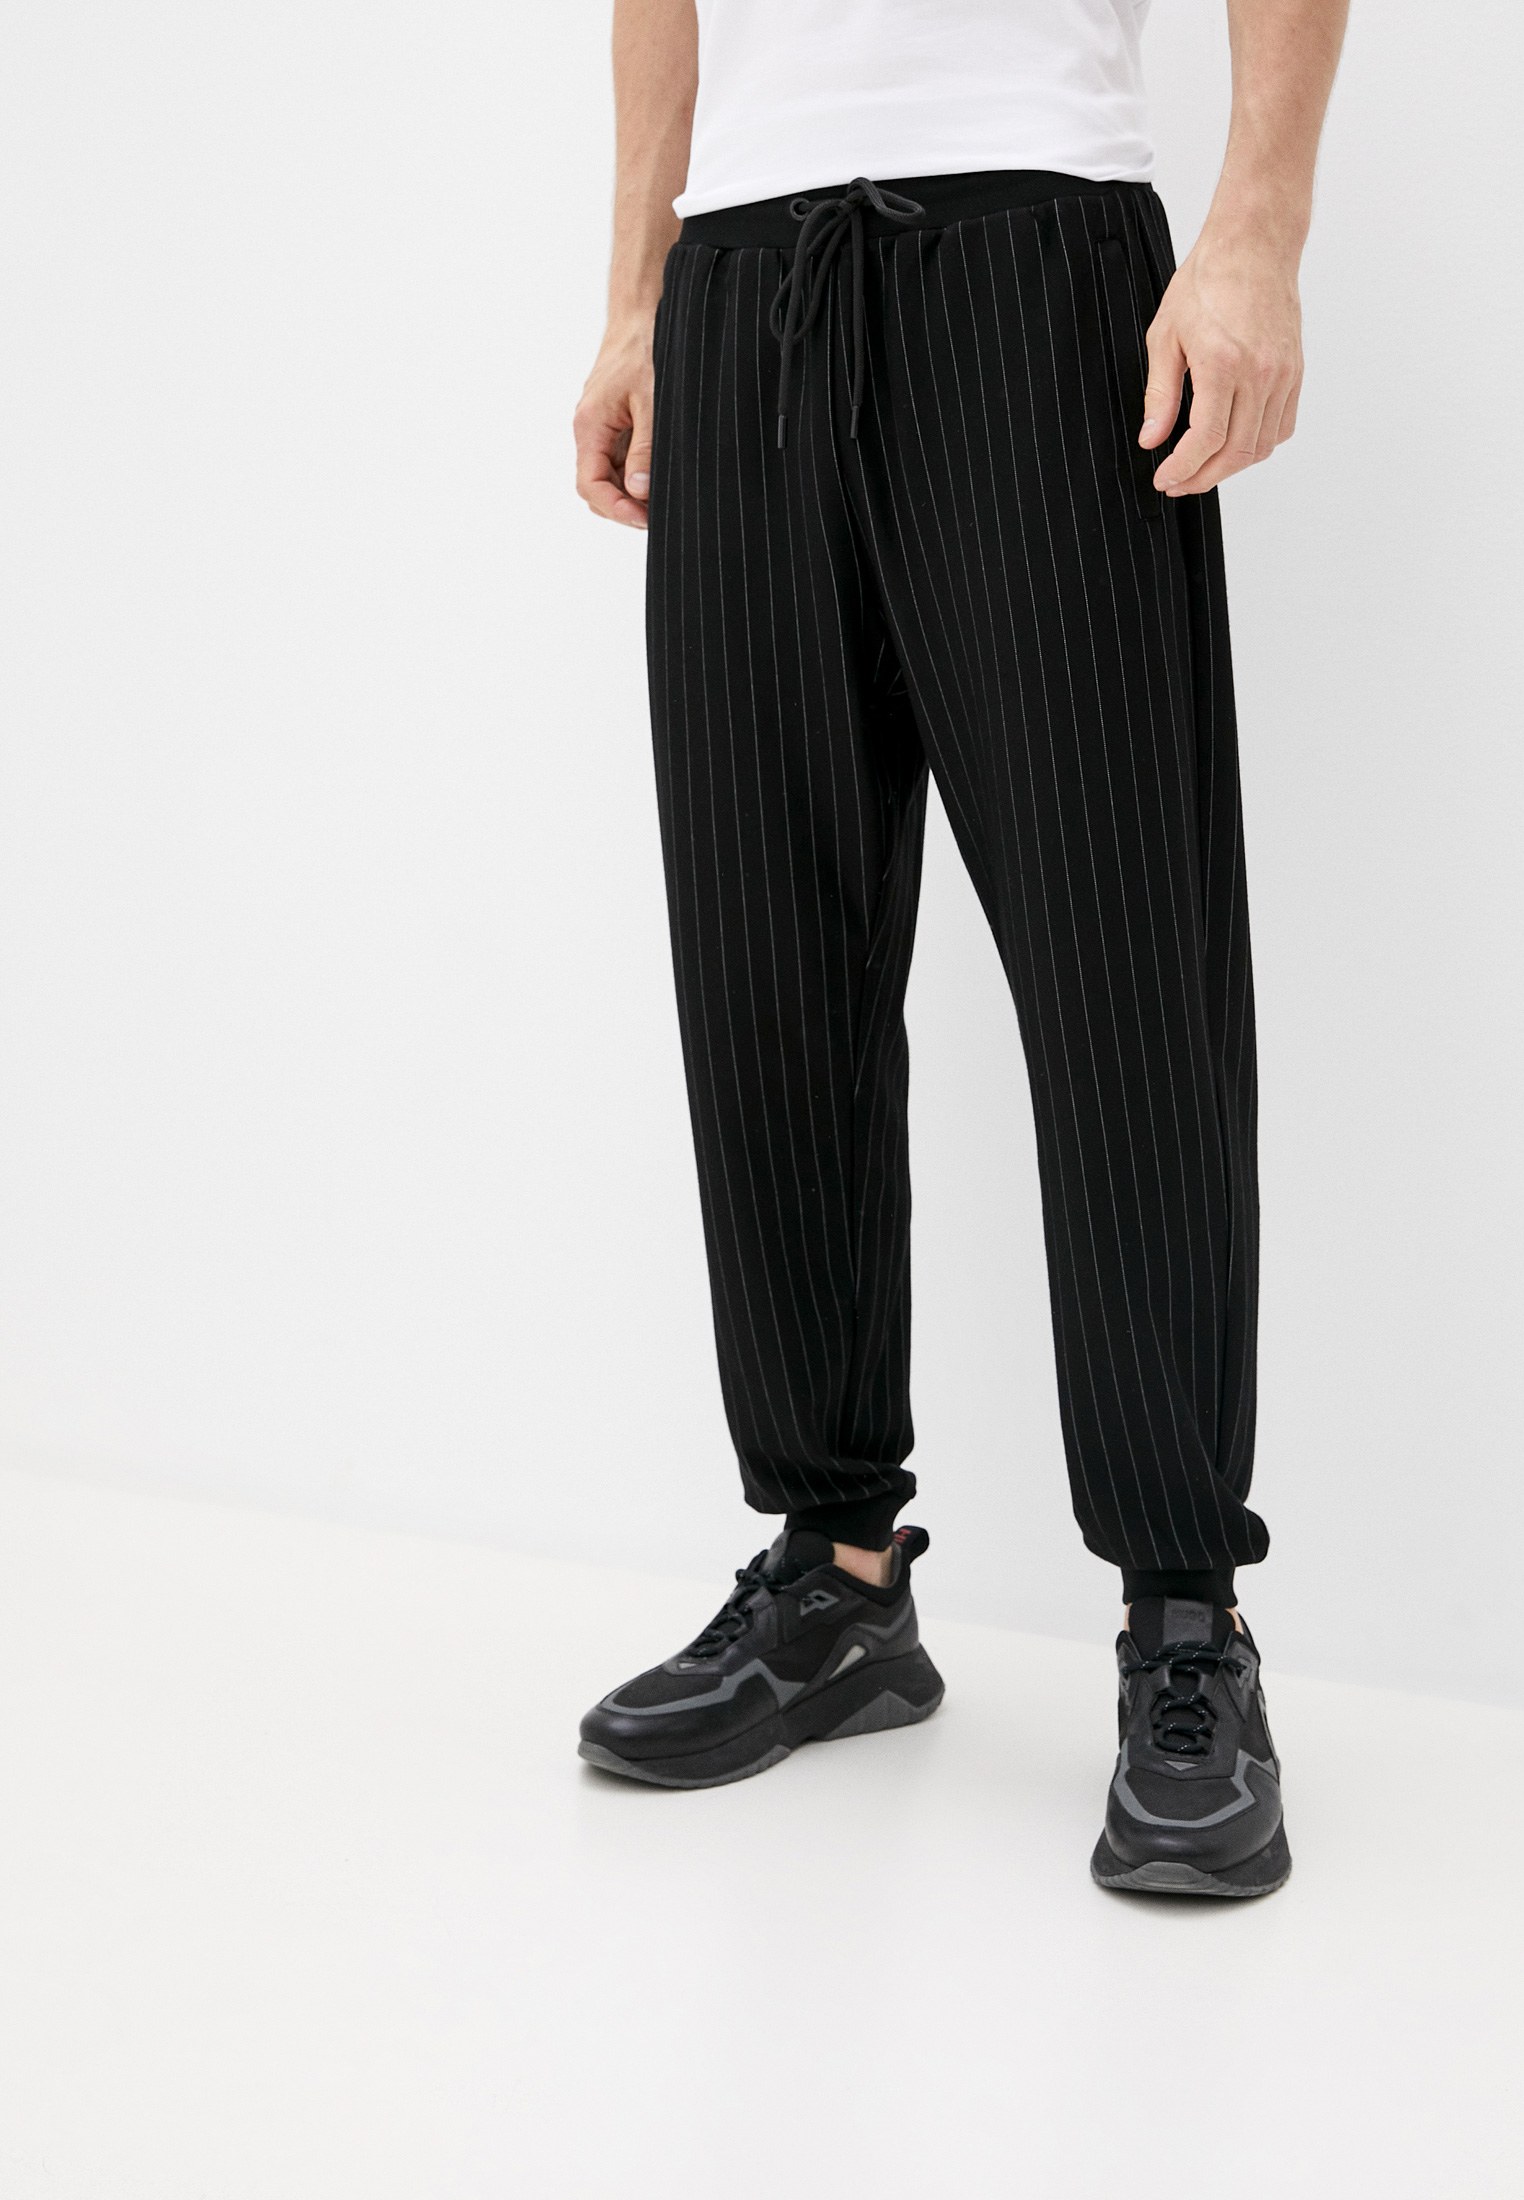 Мужские спортивные брюки Bikkembergs (Биккембергс) C 1 155 6T E 2177